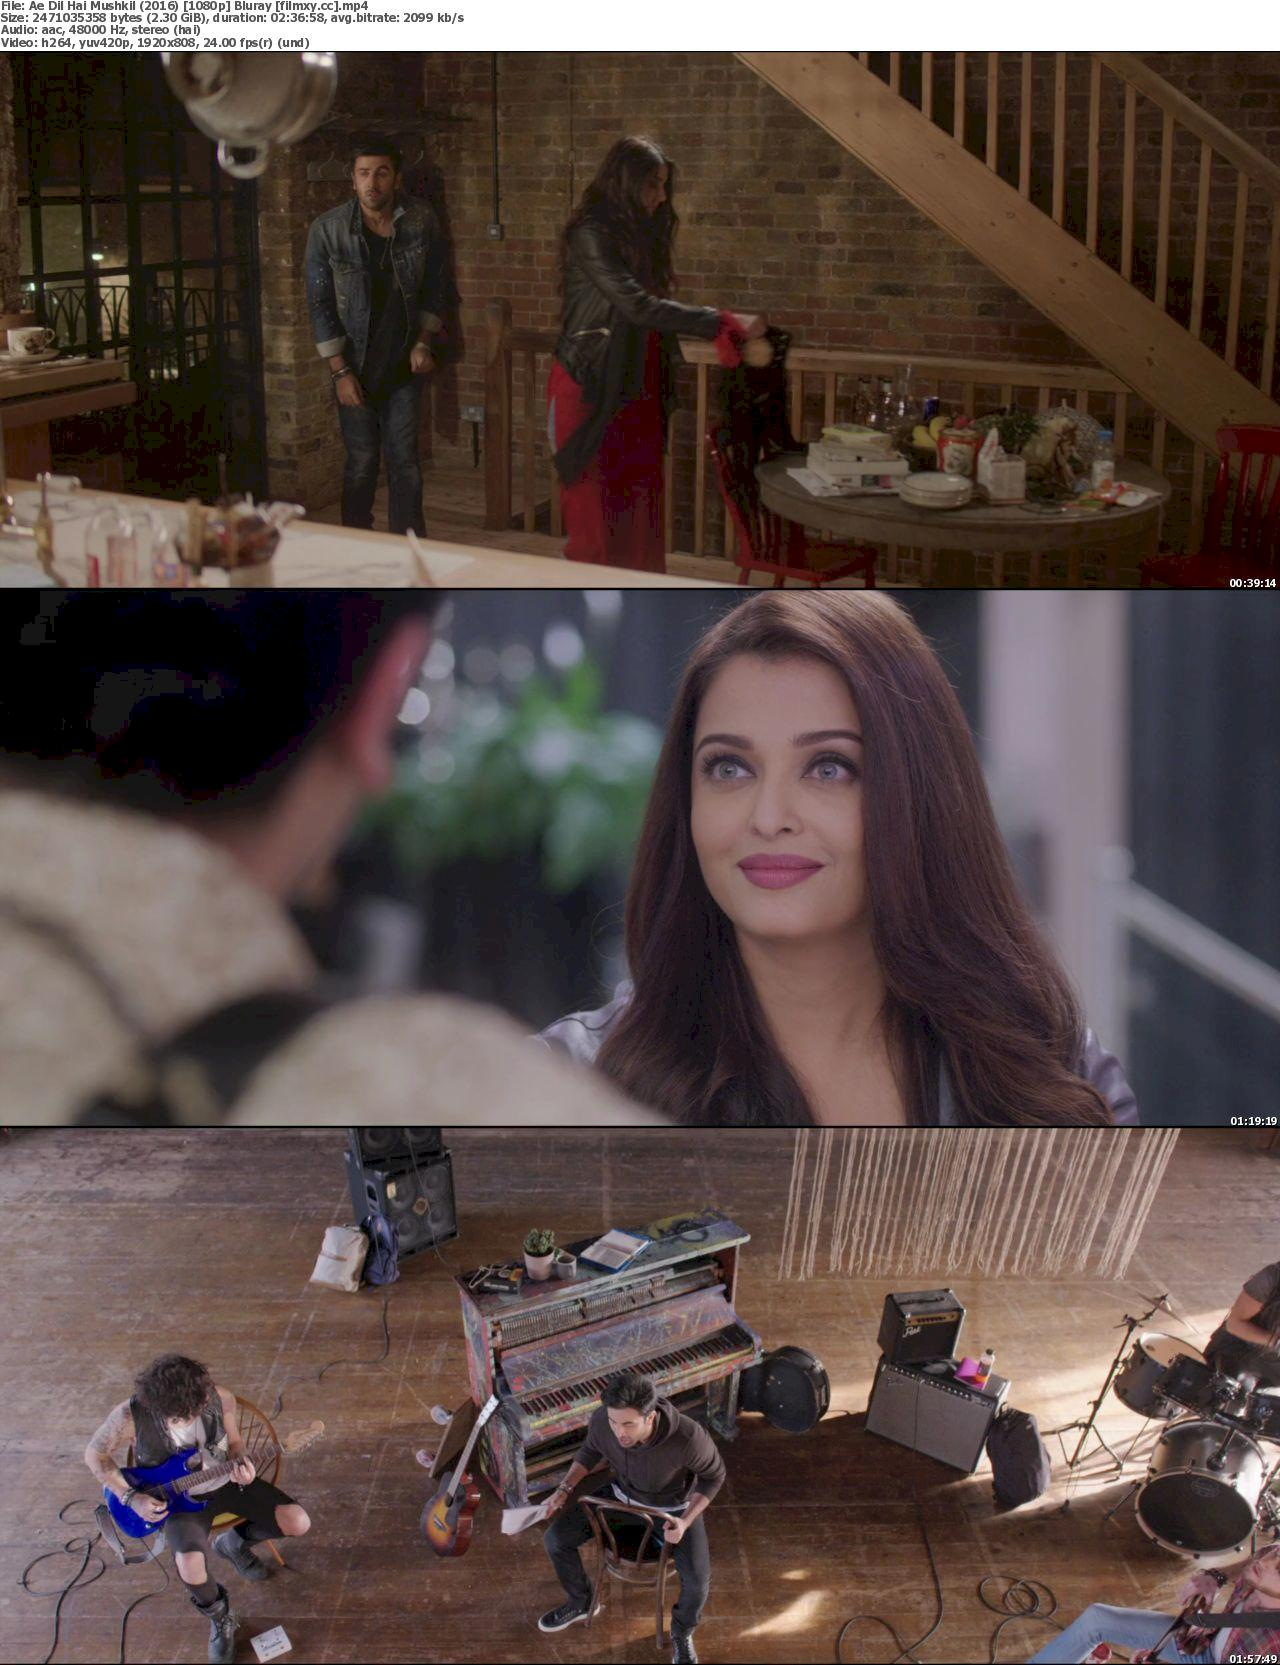 Watch Ae Dil Hai Mushkil (2016) Full Movie on Filmxy